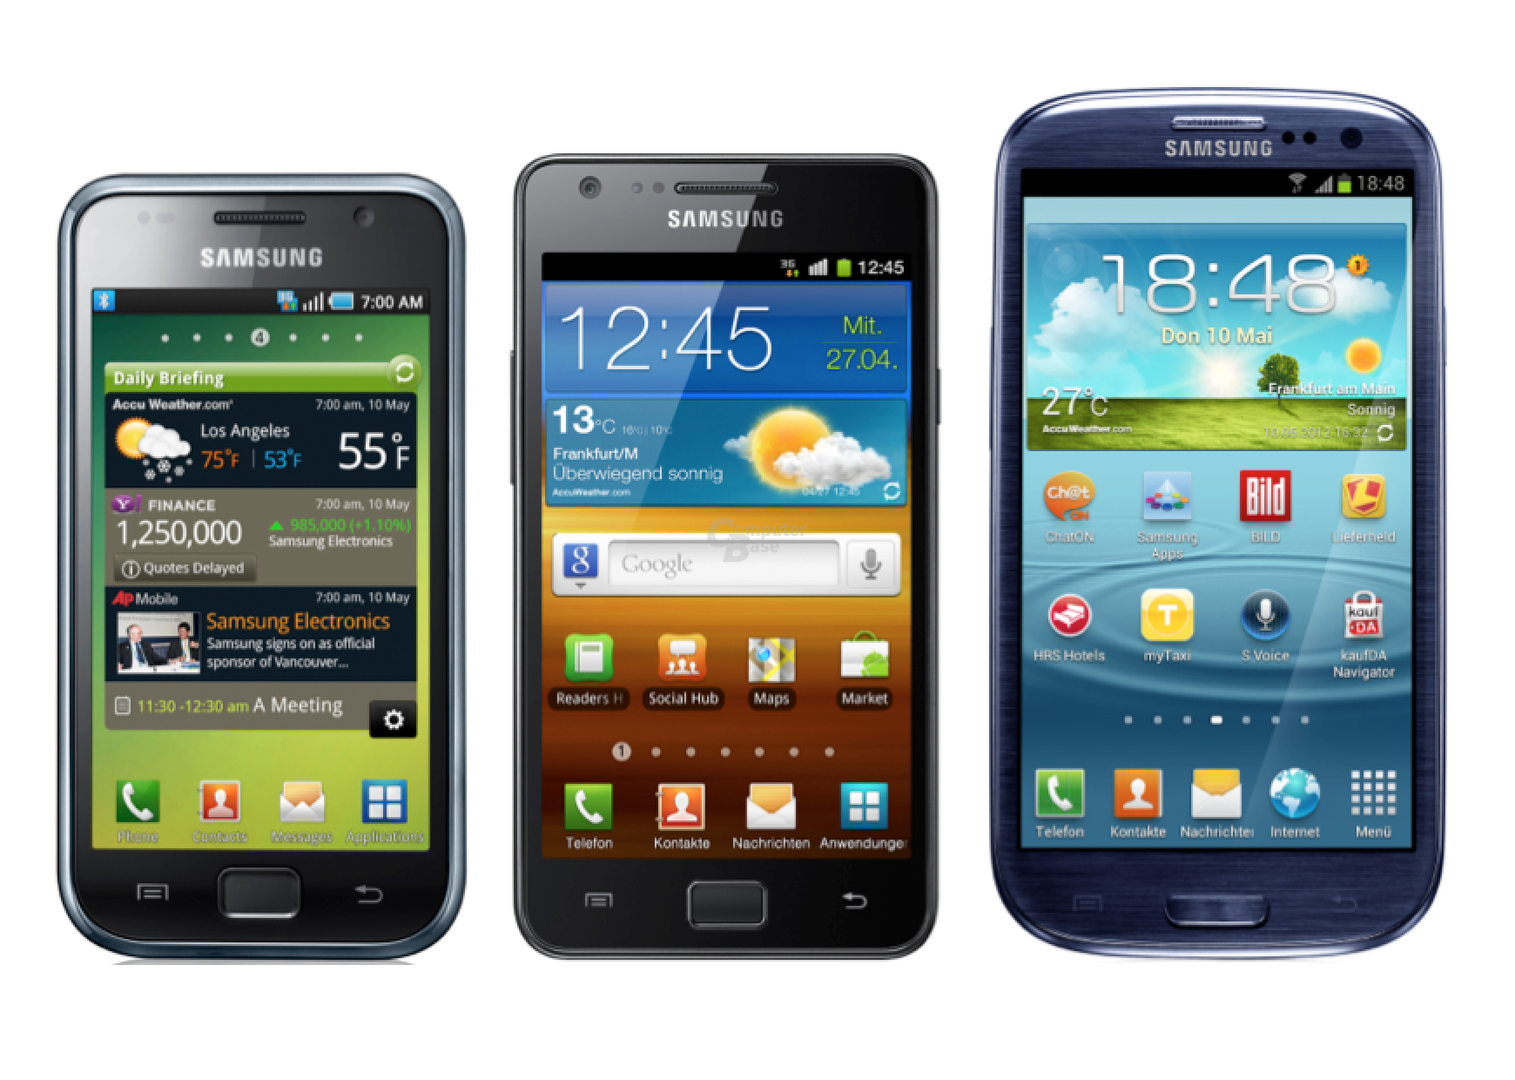 Samsung Galaxy S I bis III